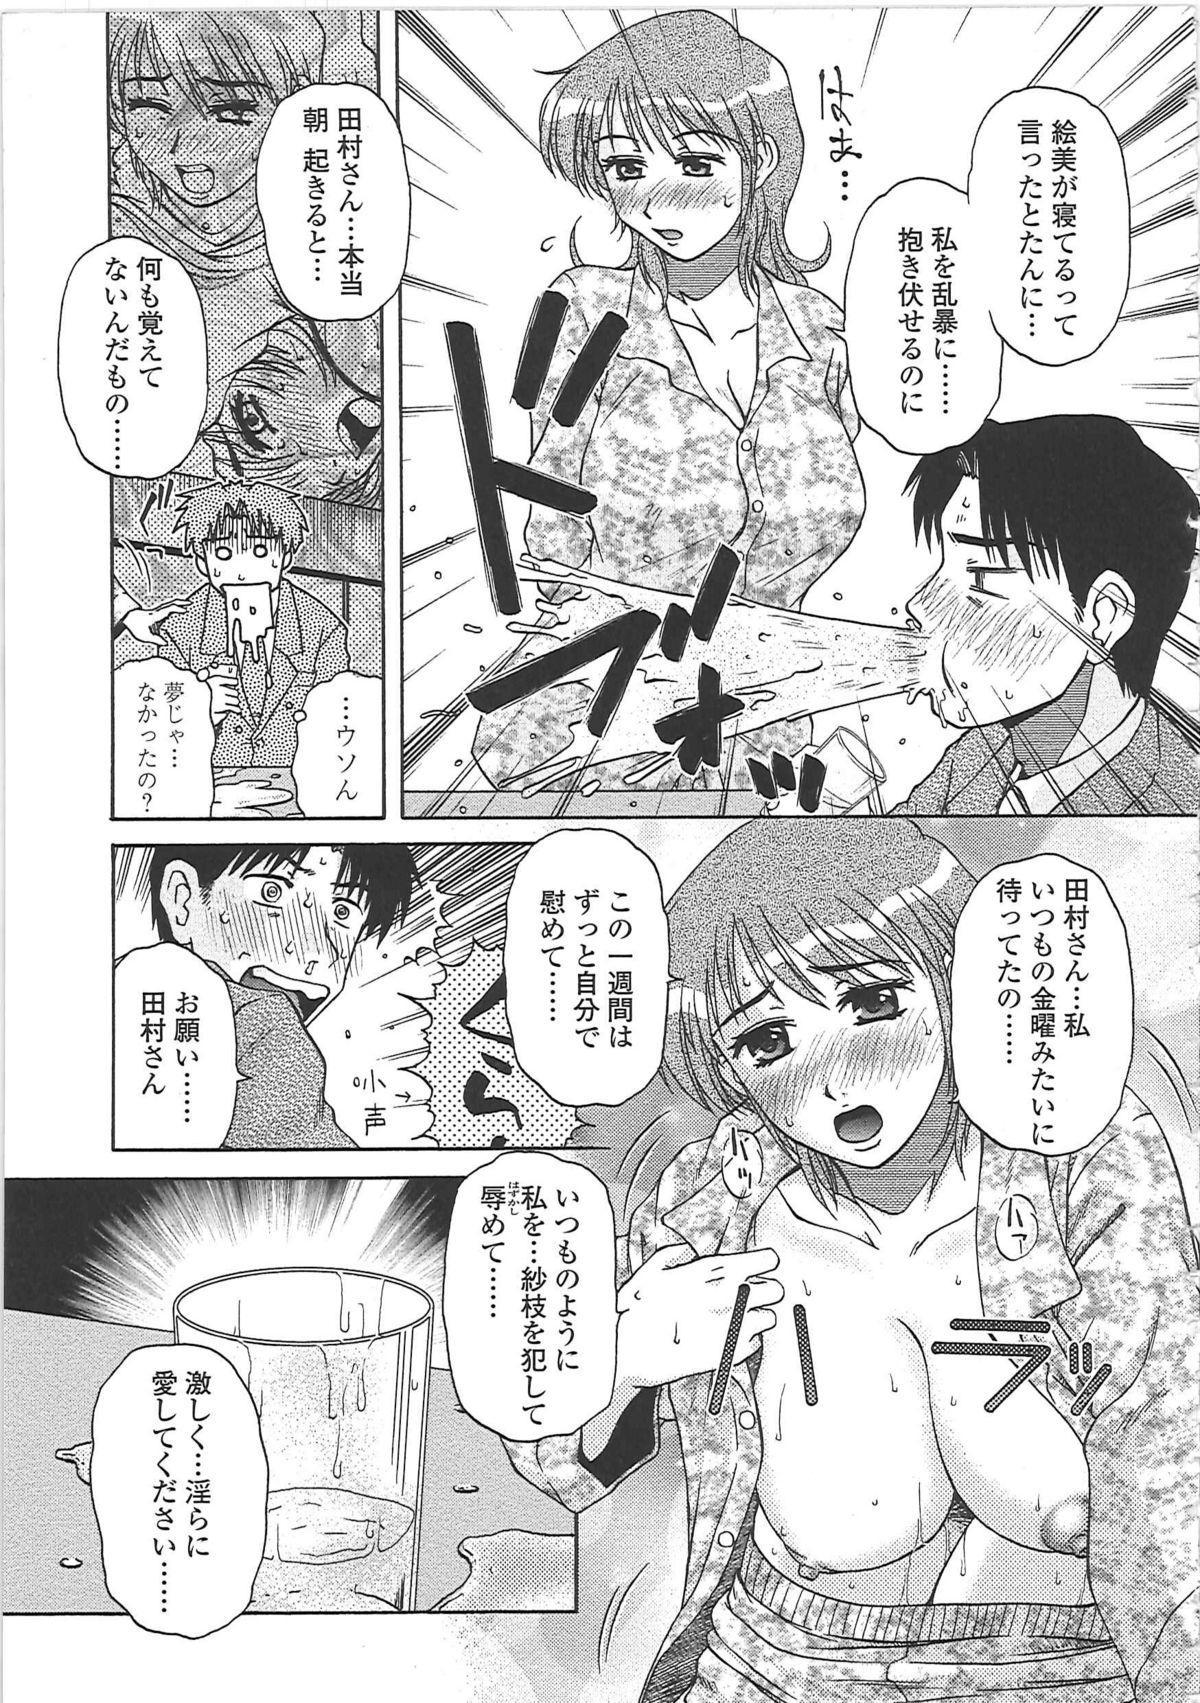 Nikuzuma Tsuushin - Erotic Wife Communication 101